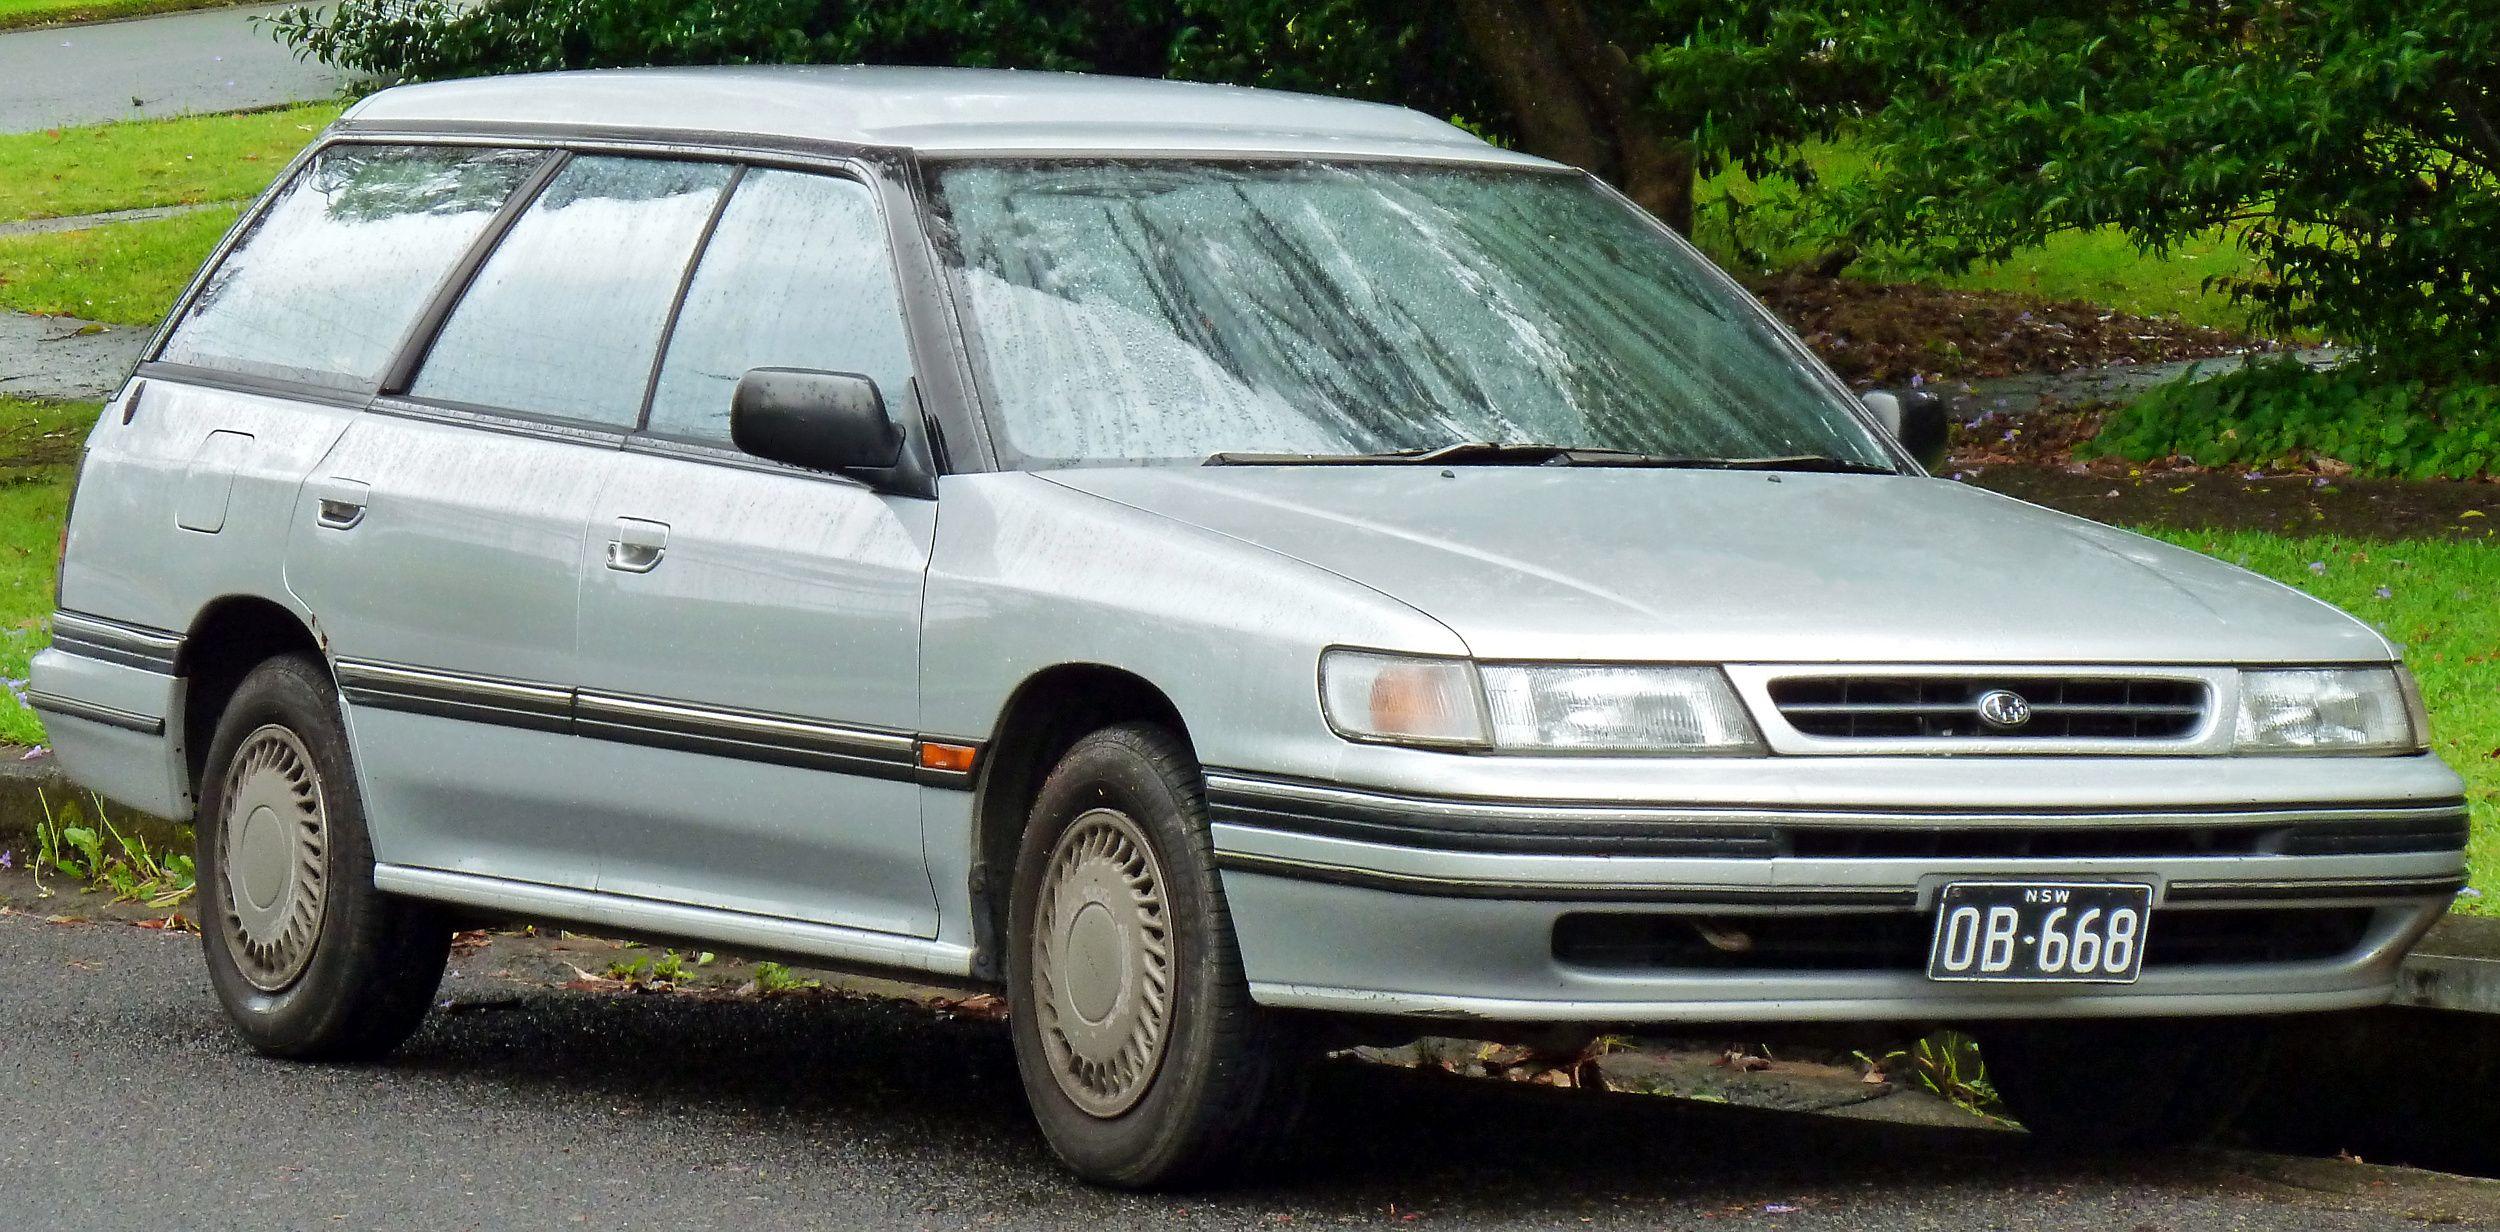 1992 Subaru Legacy Wagon Subaru legacy, Subaru legacy